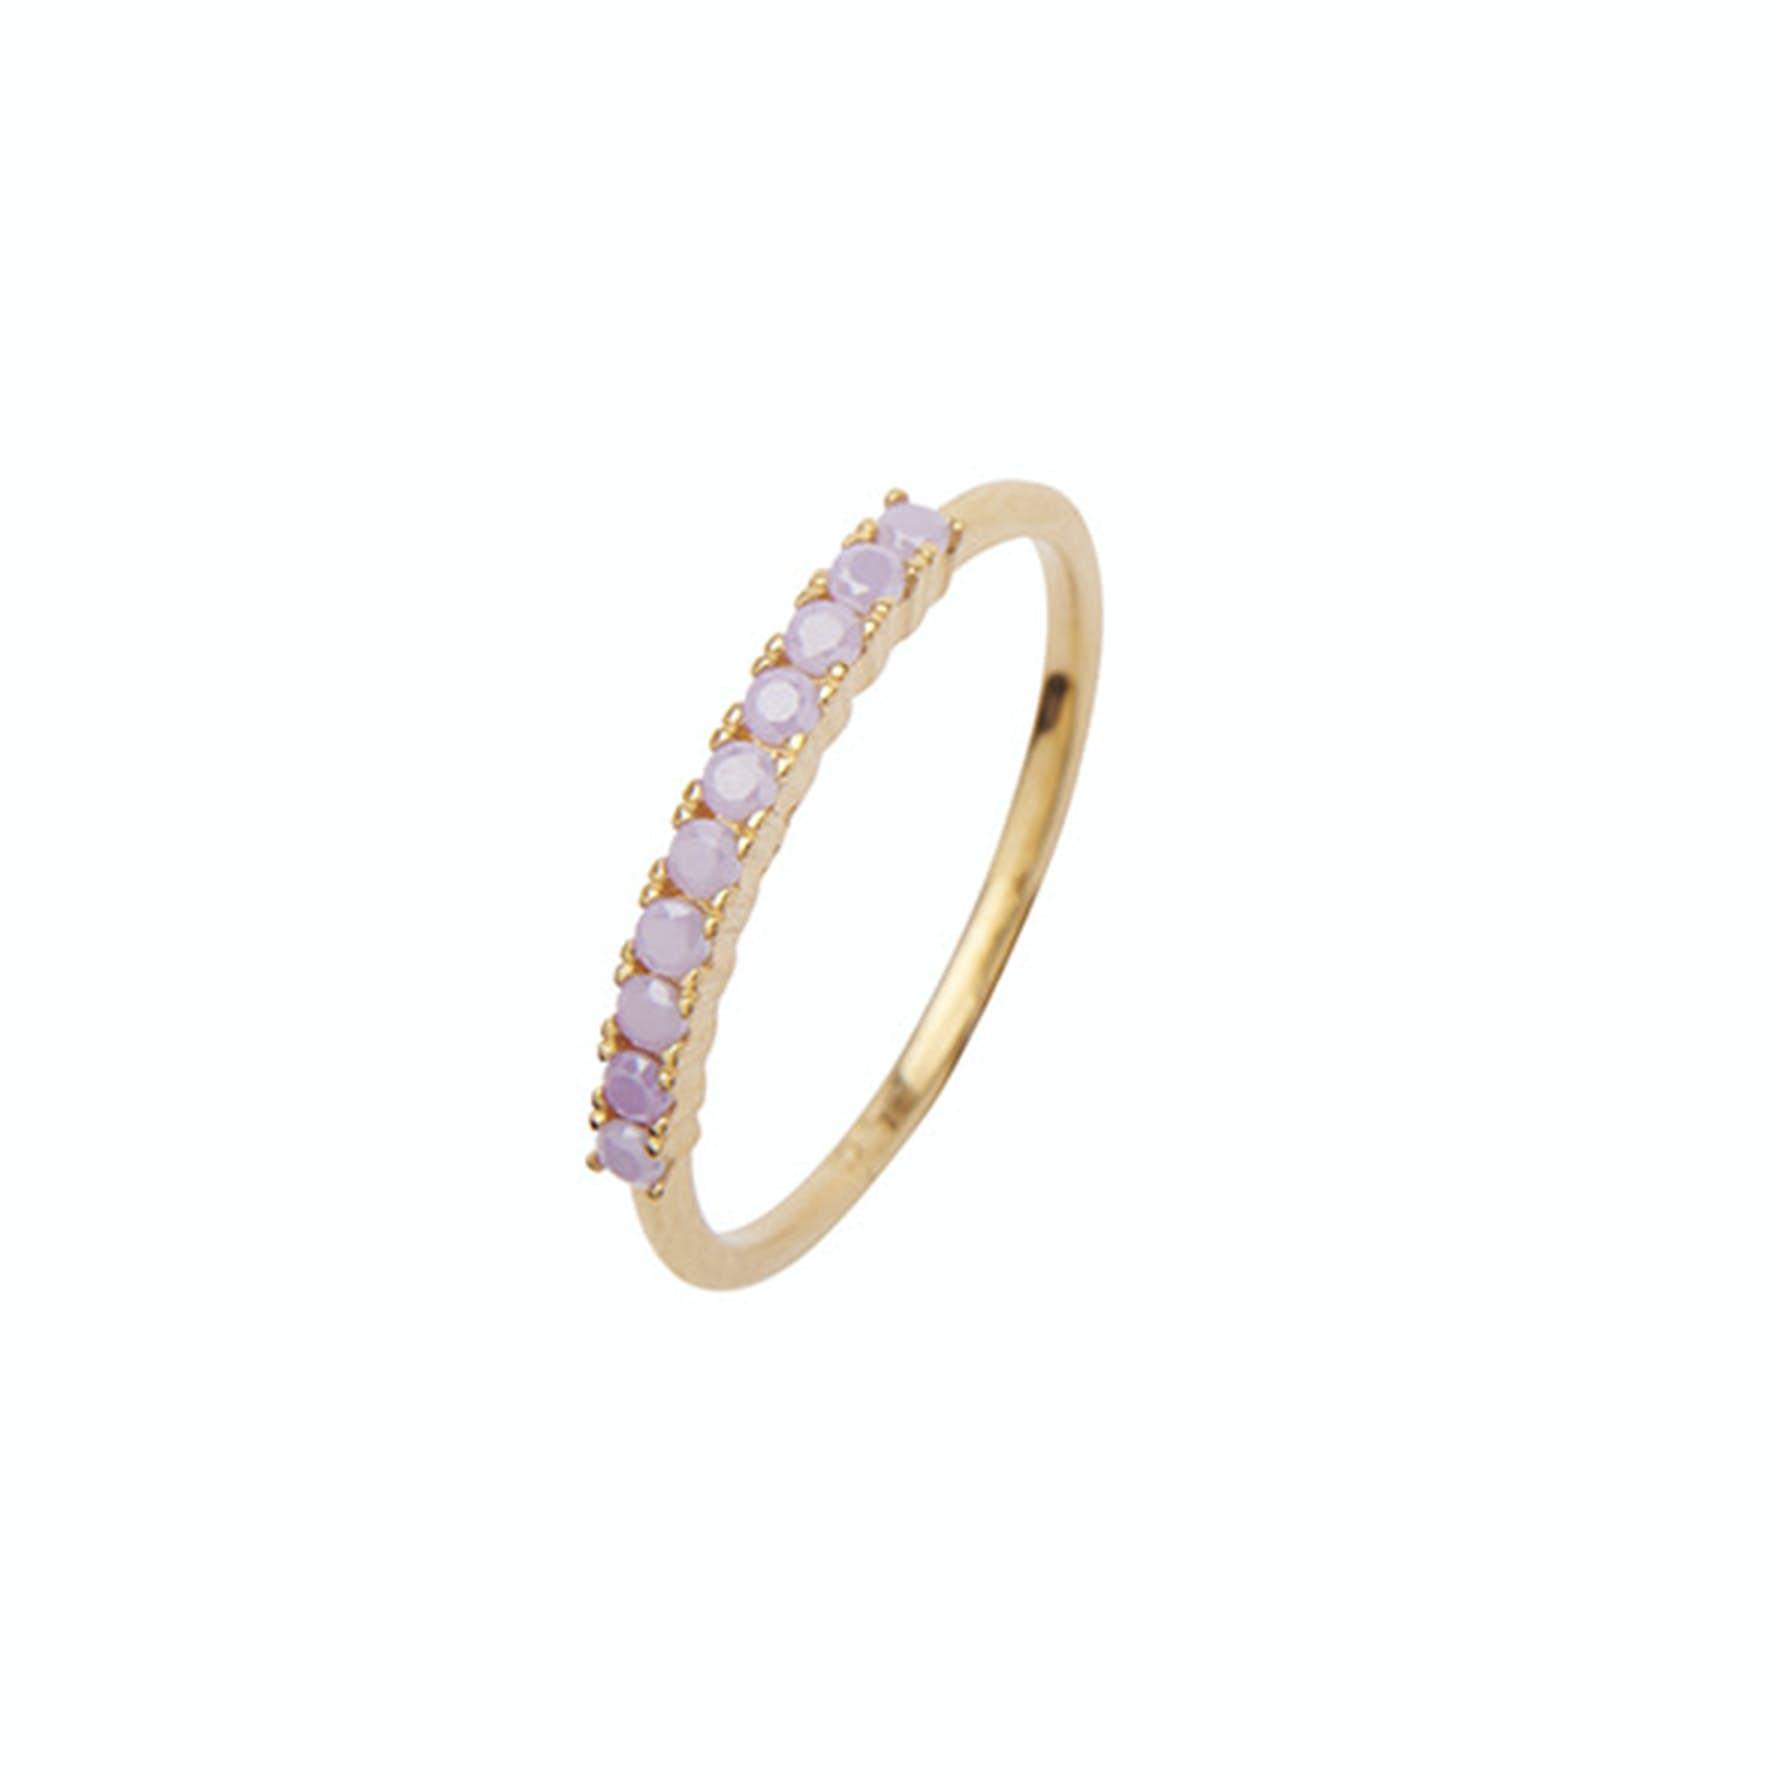 Fineley Crystal Ring fra Pico i Forgylt-Sølv Sterling 925|Purple